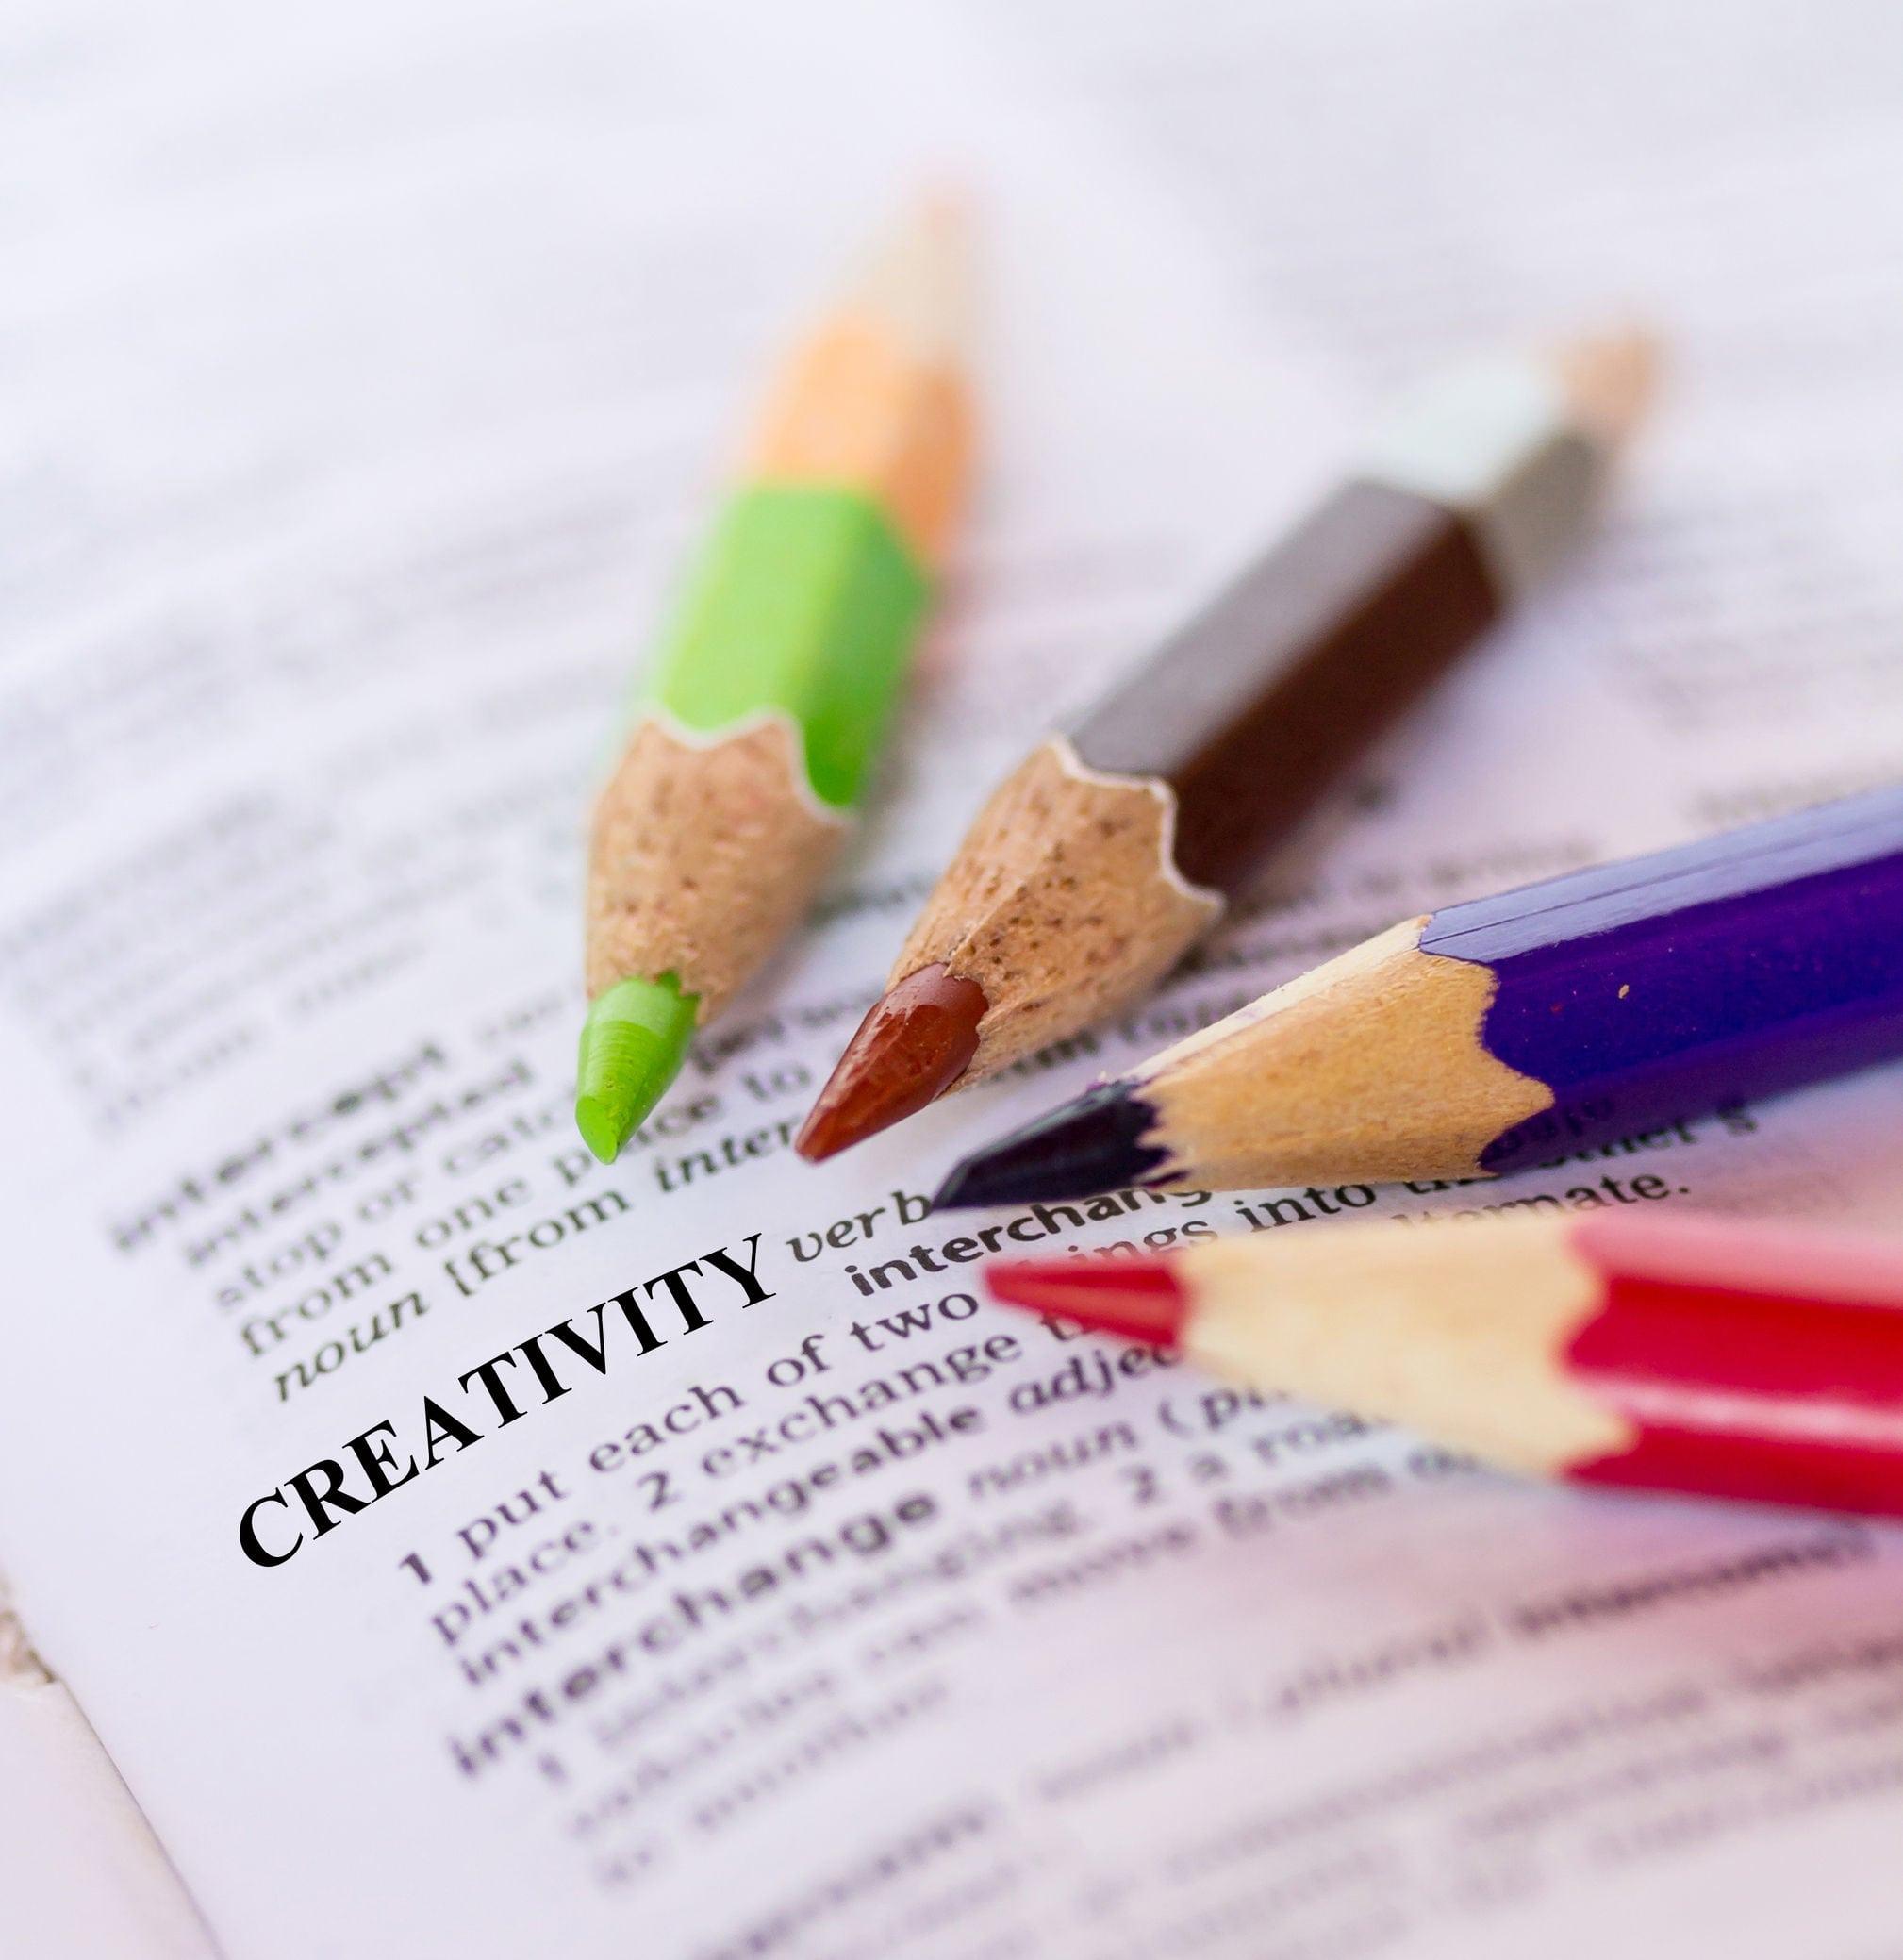 Creativity pillar